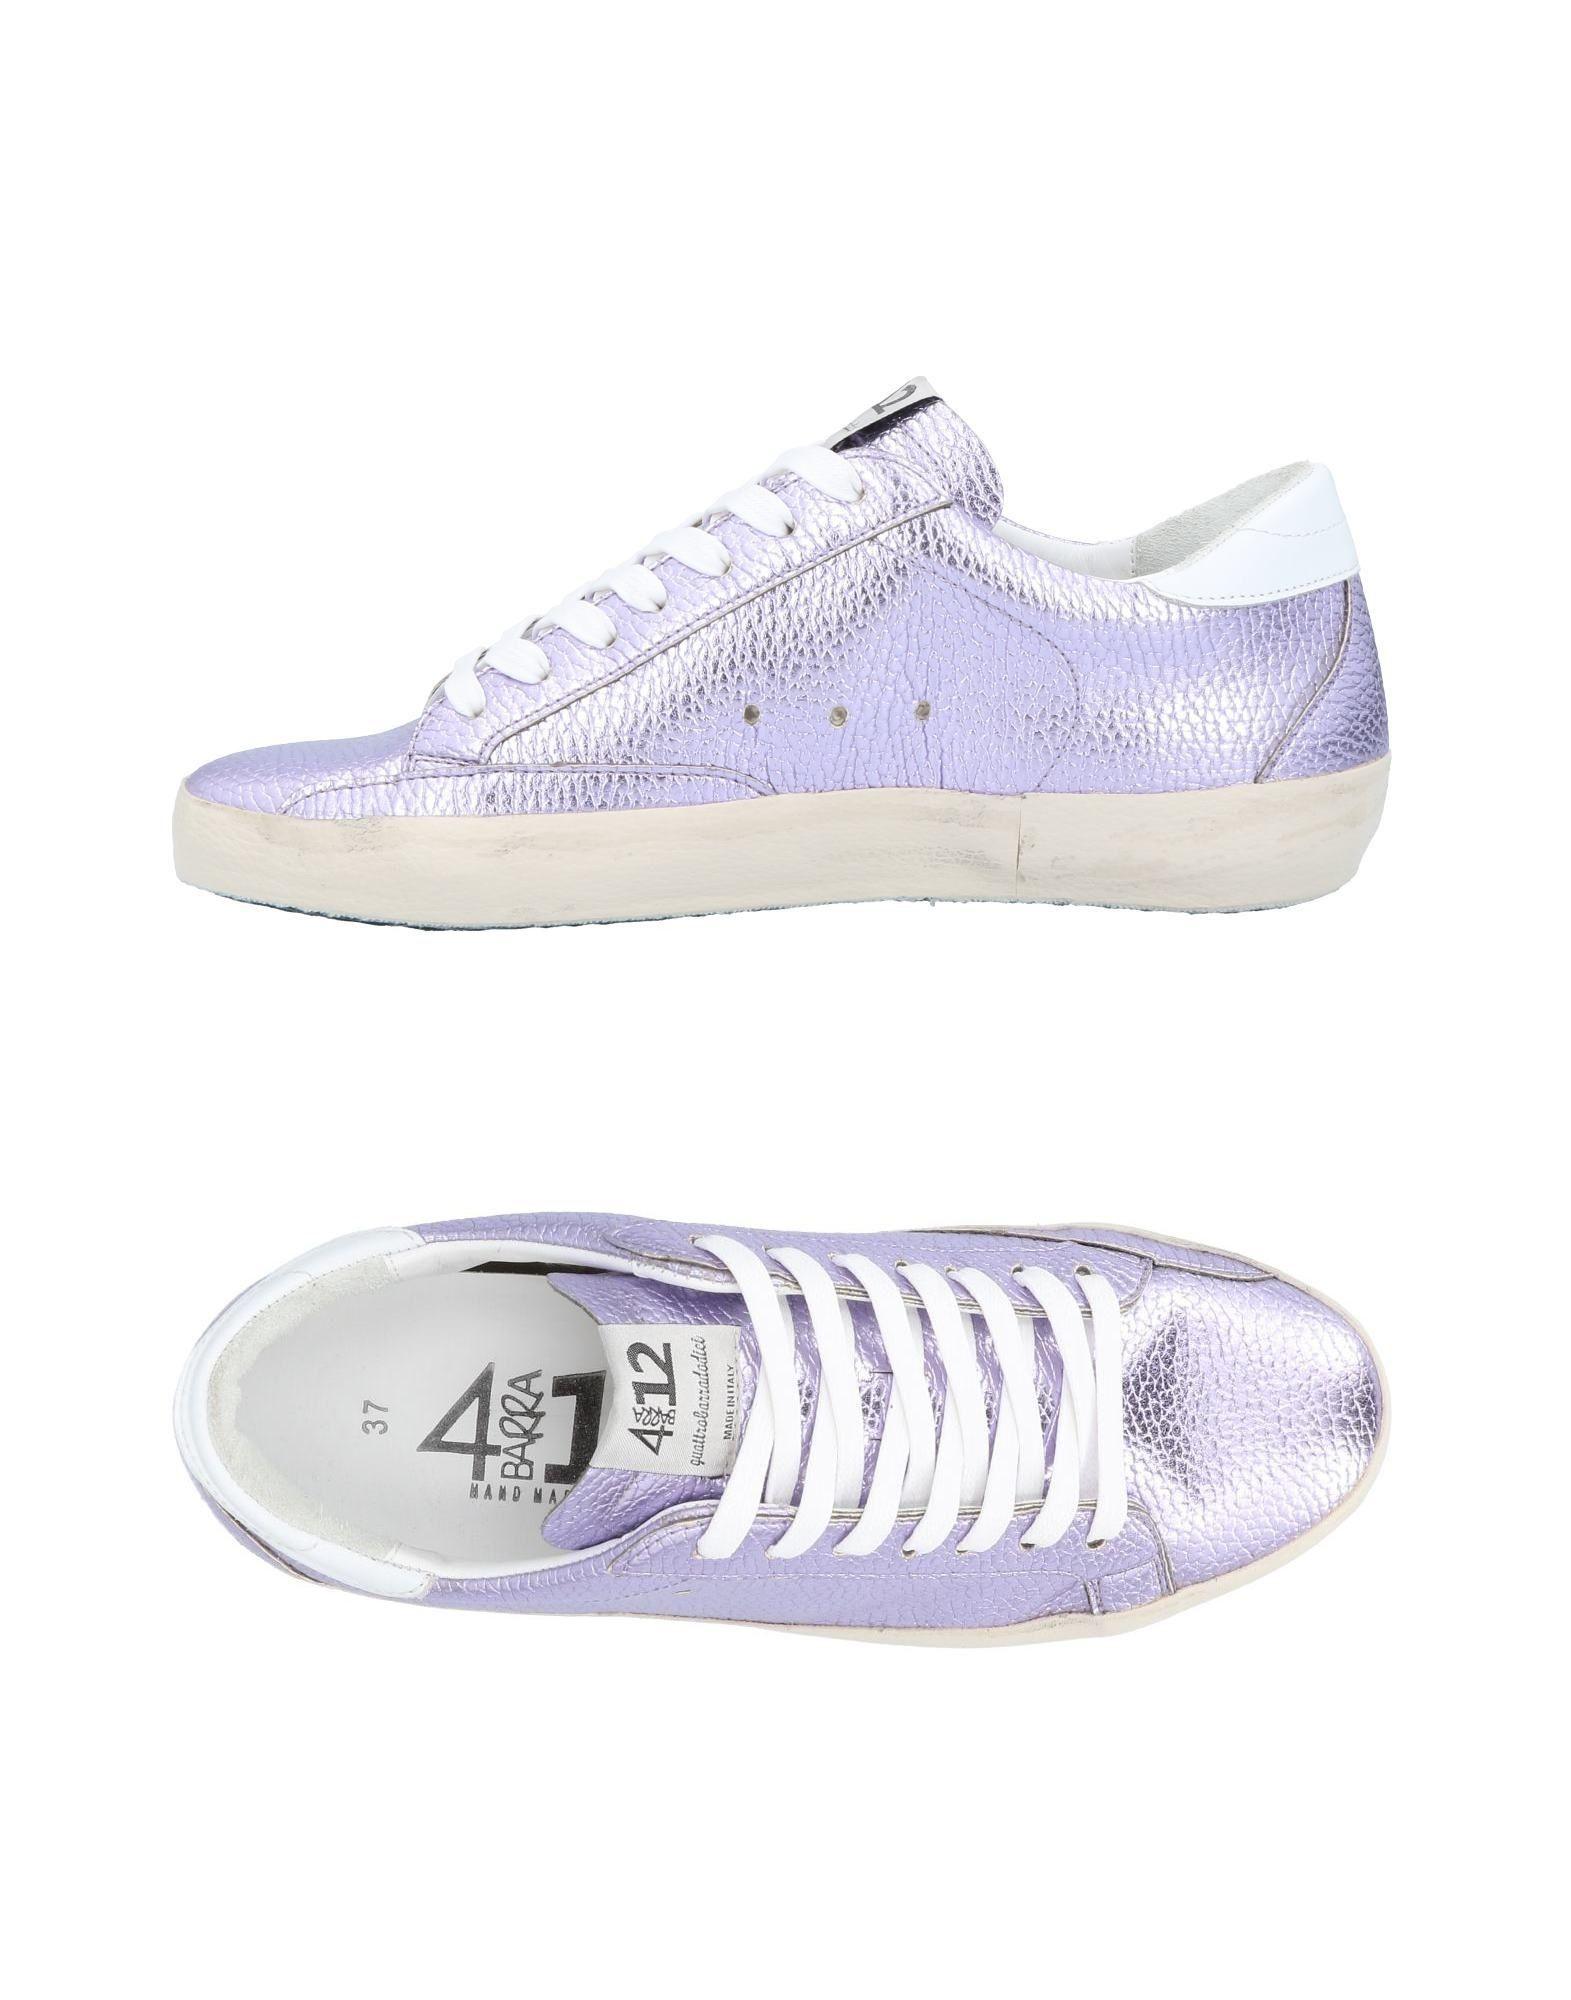 Quattrobarradodici Sneakers - Women Quattrobarradodici Sneakers online on    United Kingdom - 11433744IB 4f6828